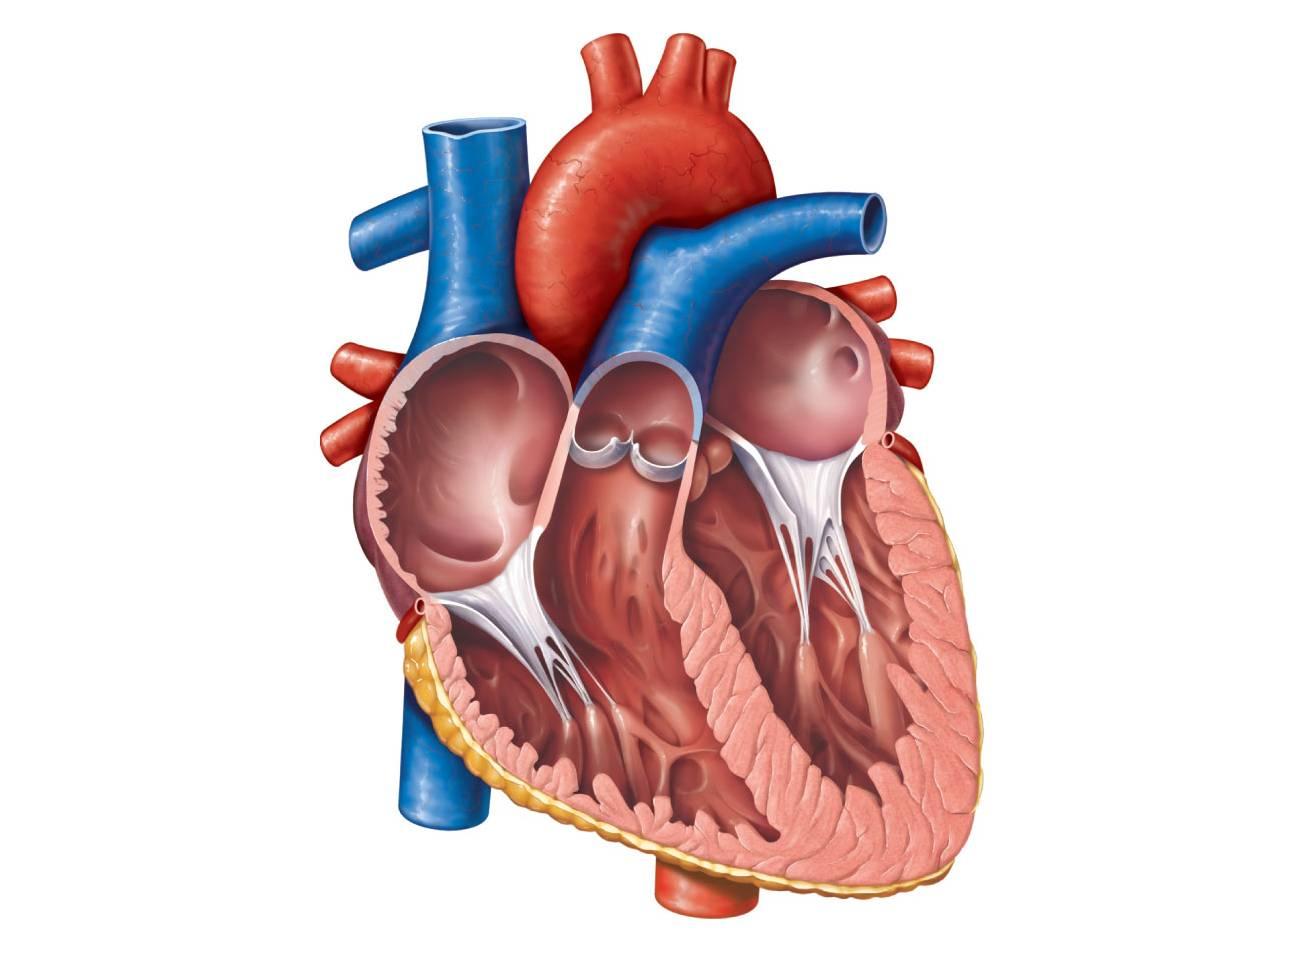 http://2.bp.blogspot.com/-0DftKe7pDvk/TanlQ0gO5VI/AAAAAAAAAOY/DC7Esf1hfps/s1600/heart%20chambers.jpg